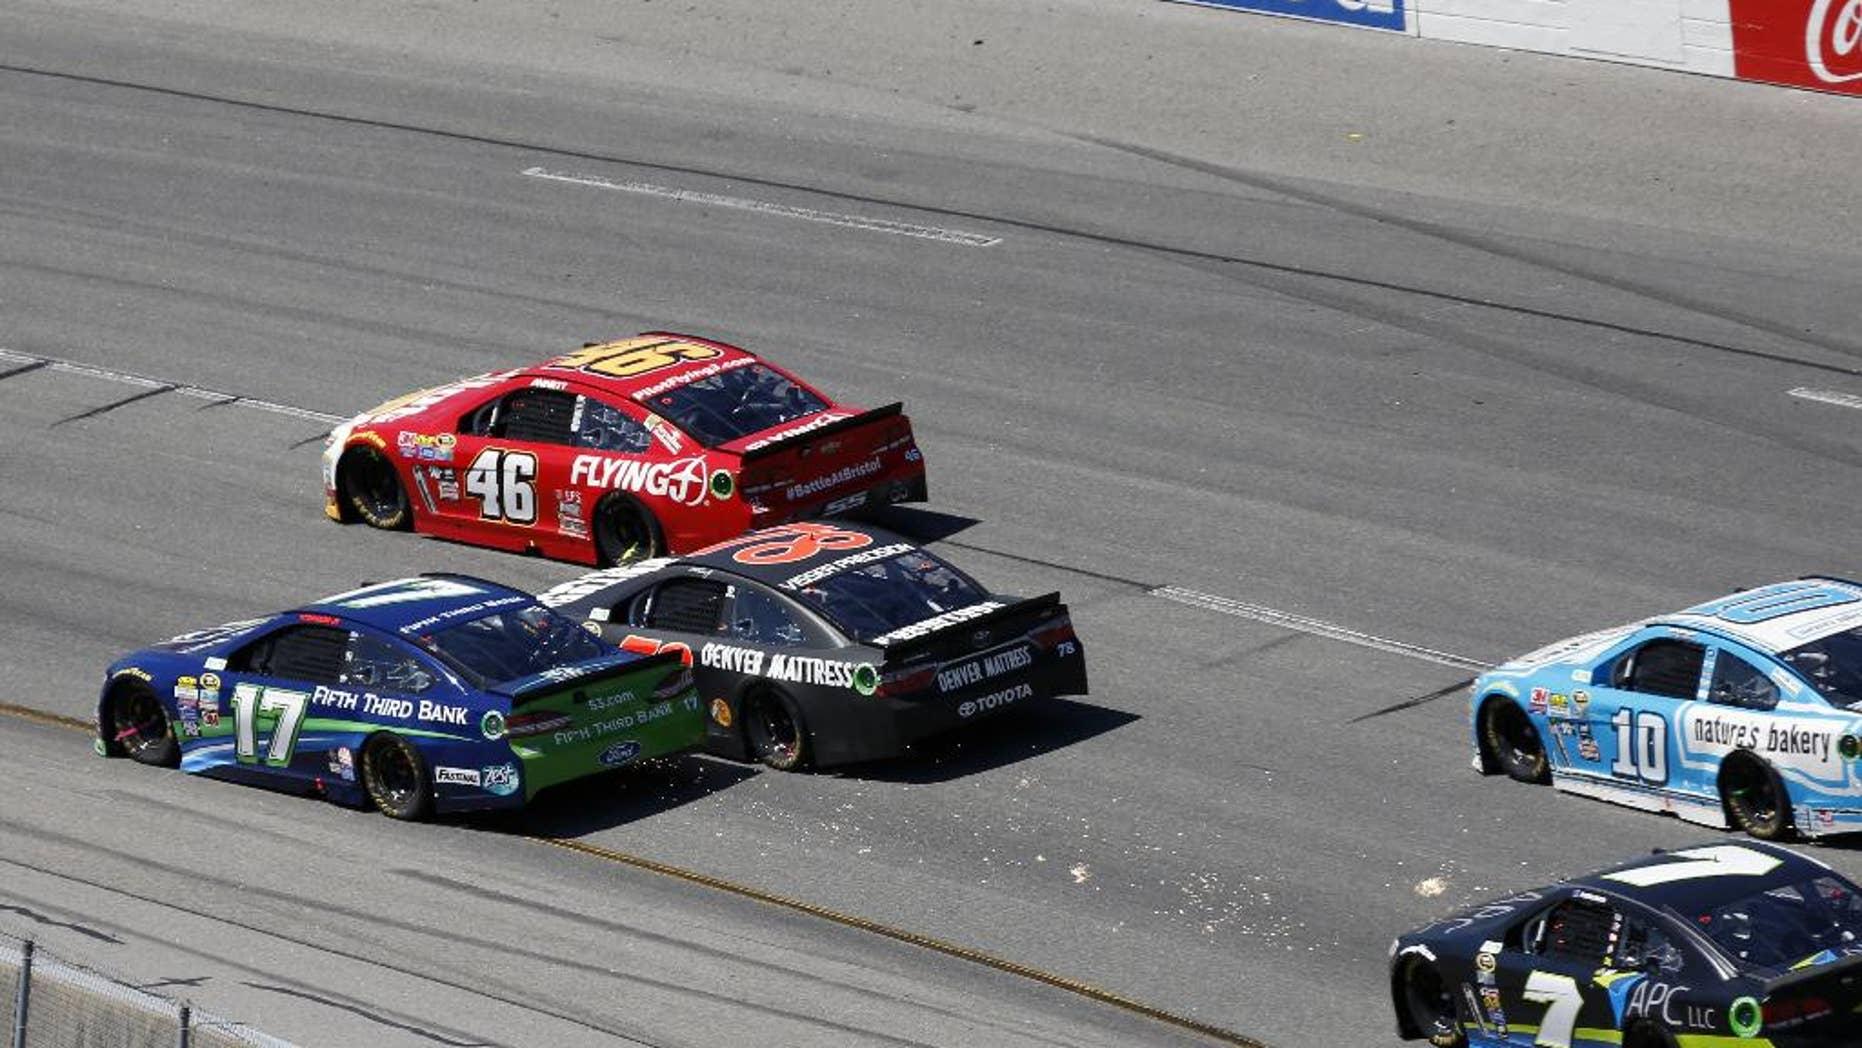 Ricky Stenhouse Jr. and Martin Truex Jr. make contact during the Sprint Cup auto race at Richmond International Raceway in Richmond, Va., Sunday, April 24, 2016. (AP Photo/Chet Strange)